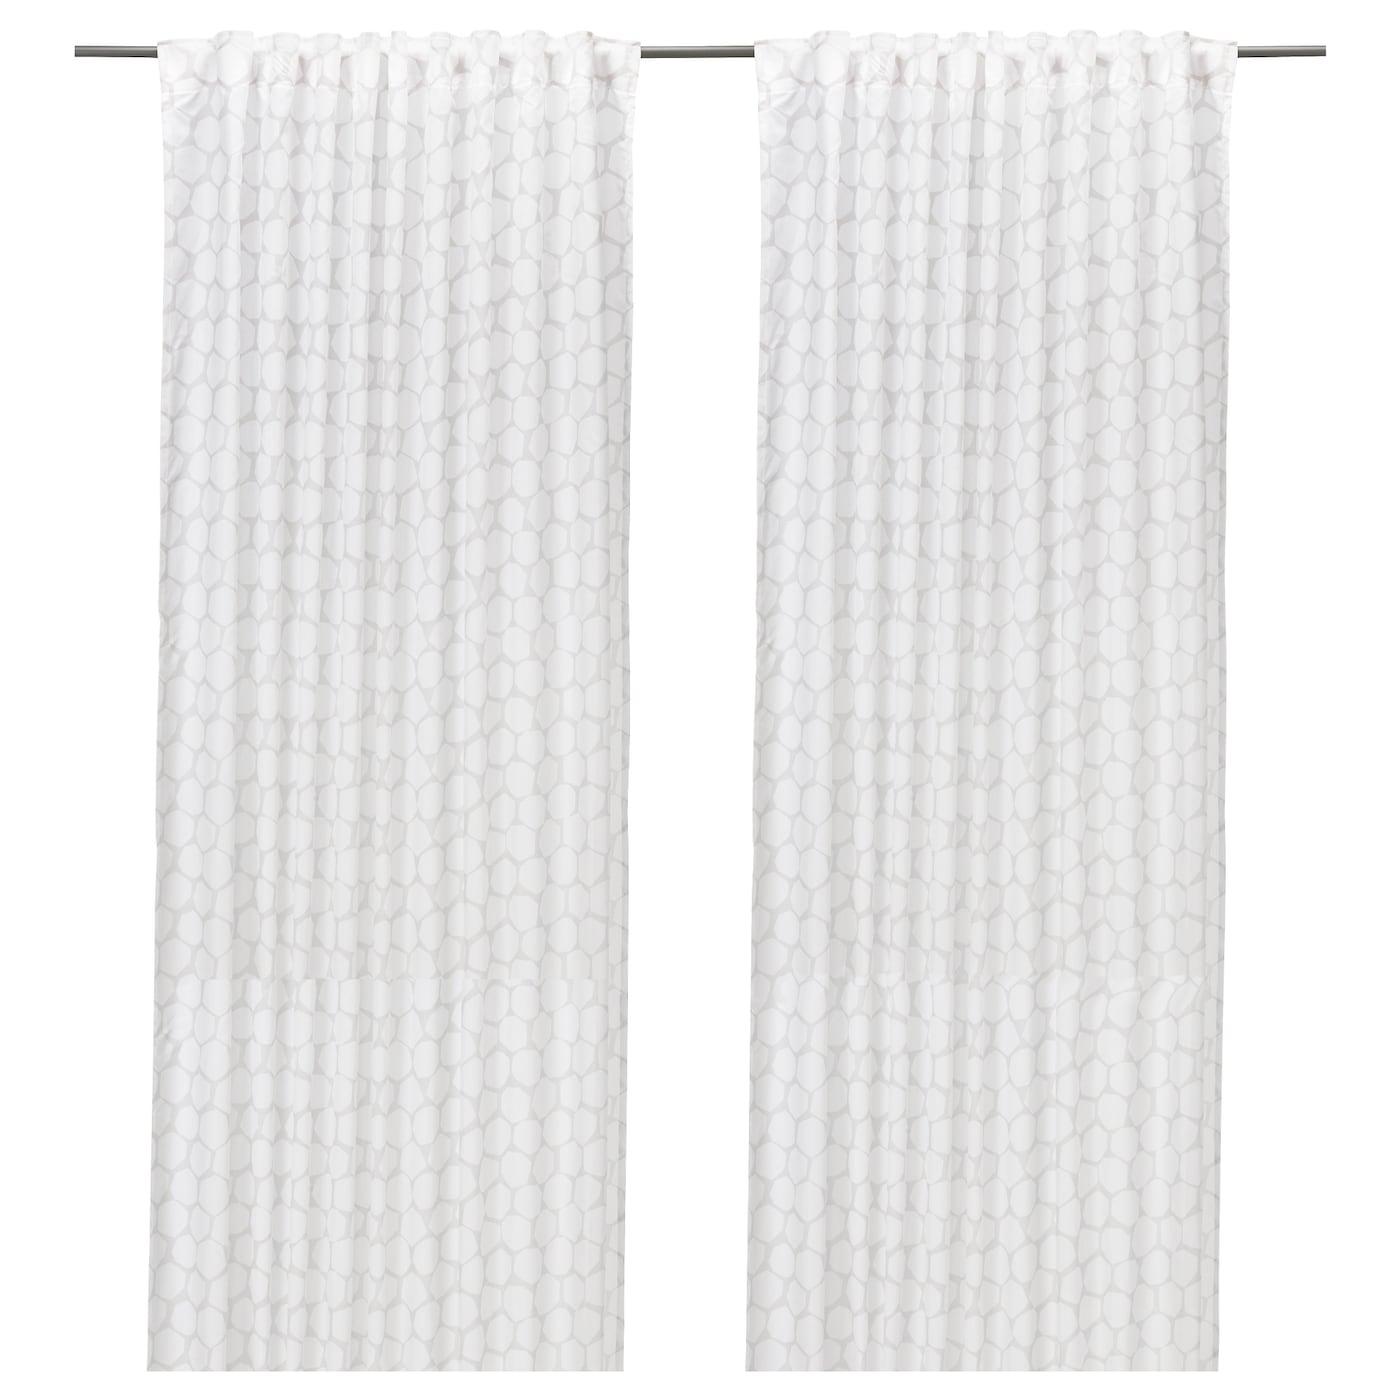 Fl Ng Curtains 1 Pair Grey 145x250 Cm Ikea